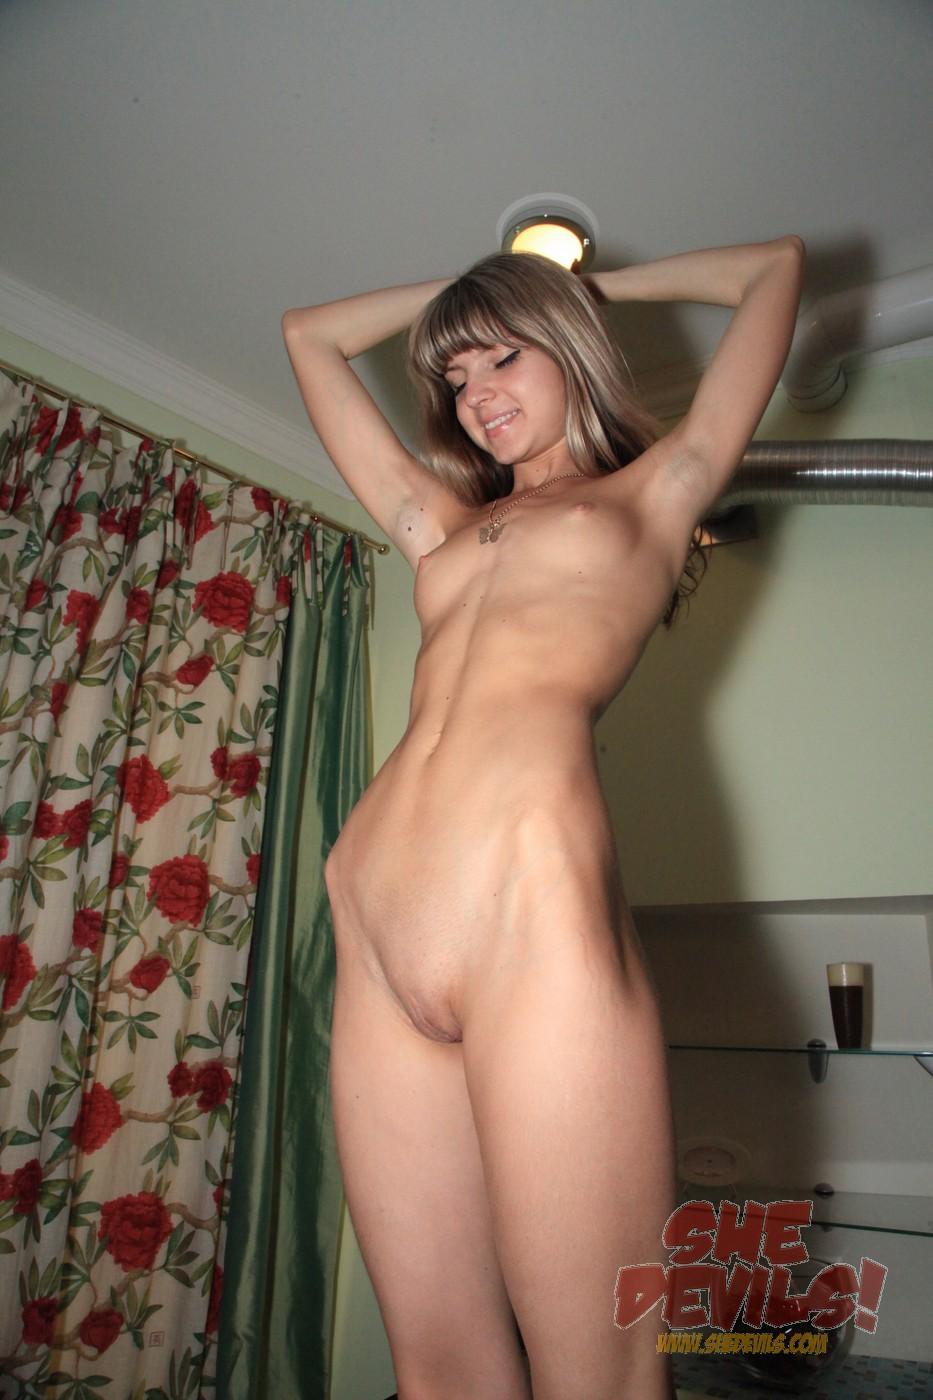 Skinny Teens Nackt